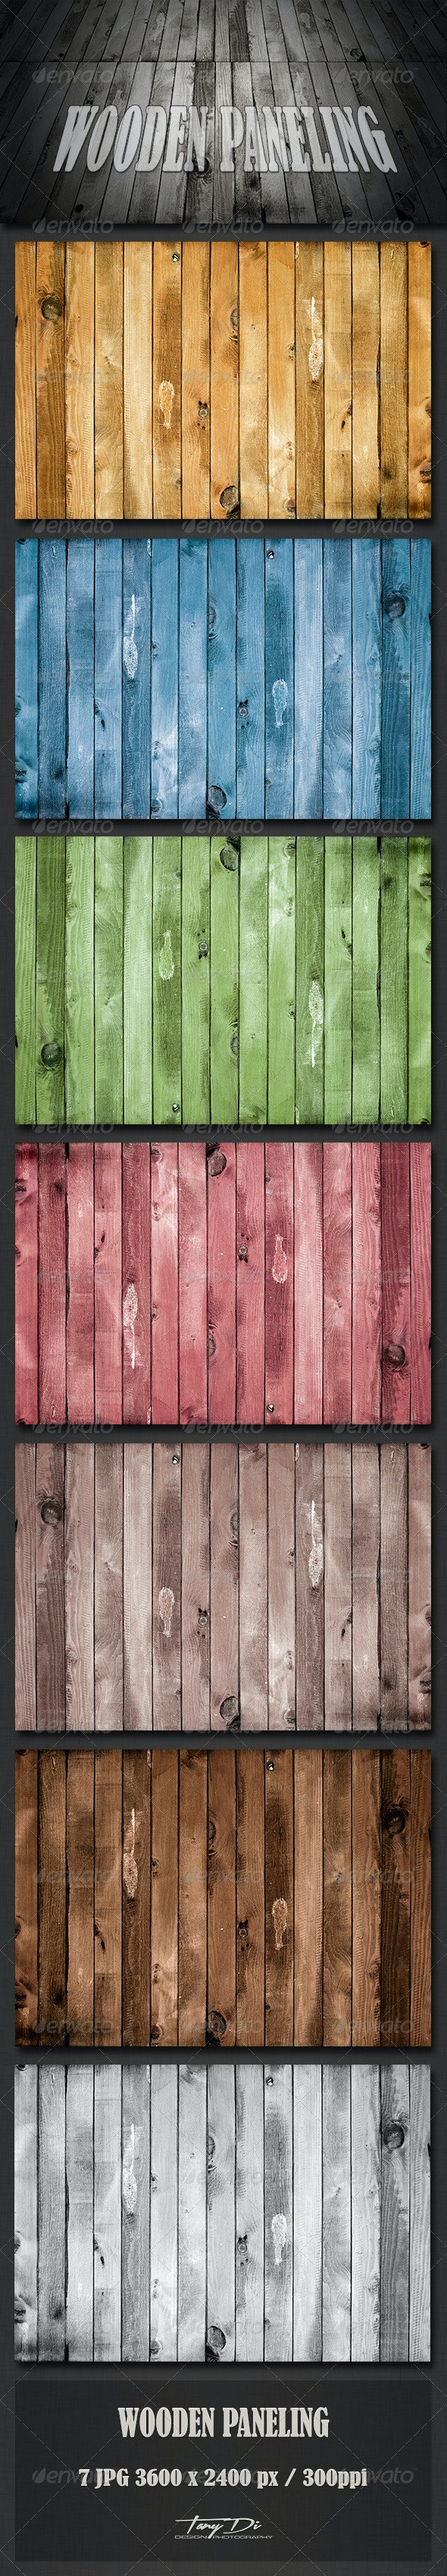 Wooden Paneling - Wood Textures